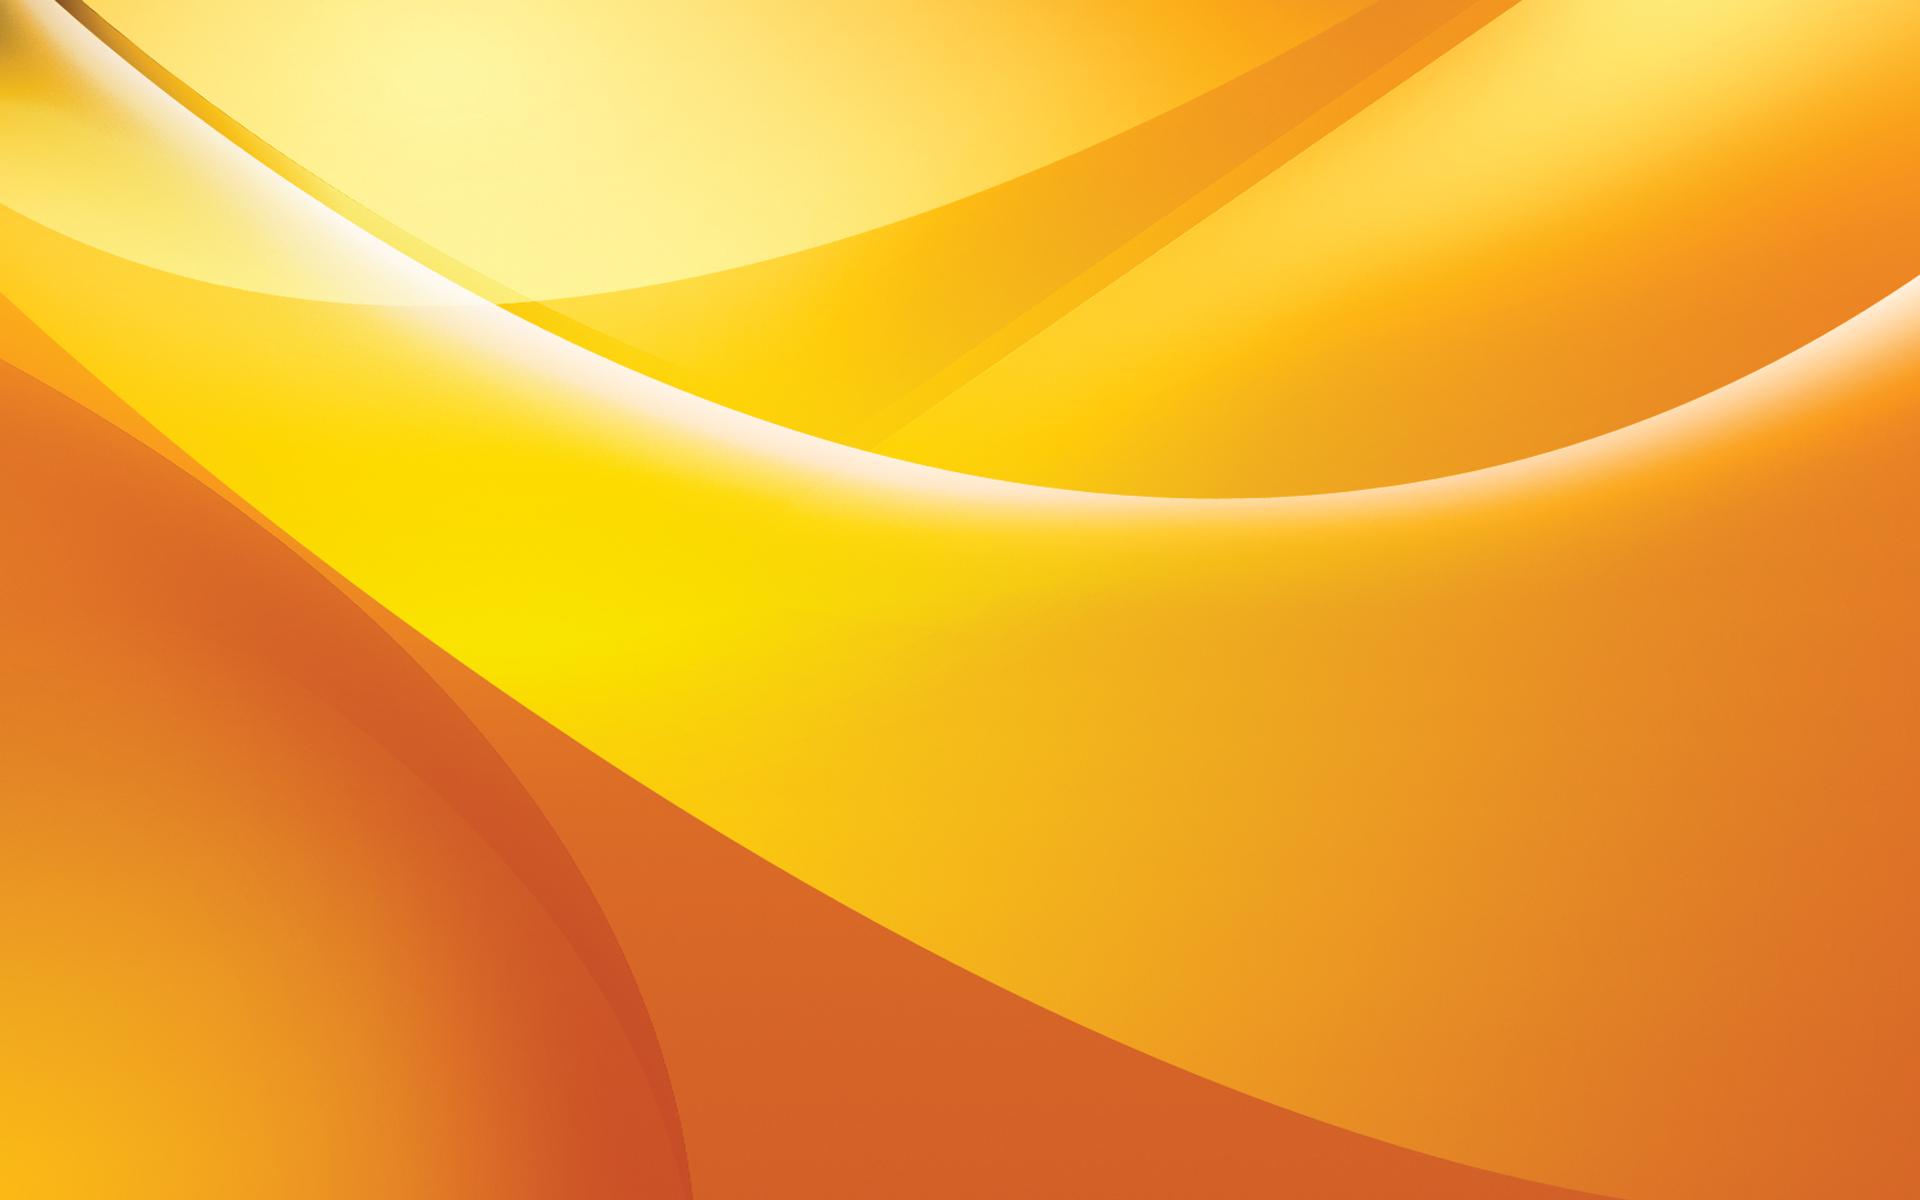 Orange curves wallpaper - 91107